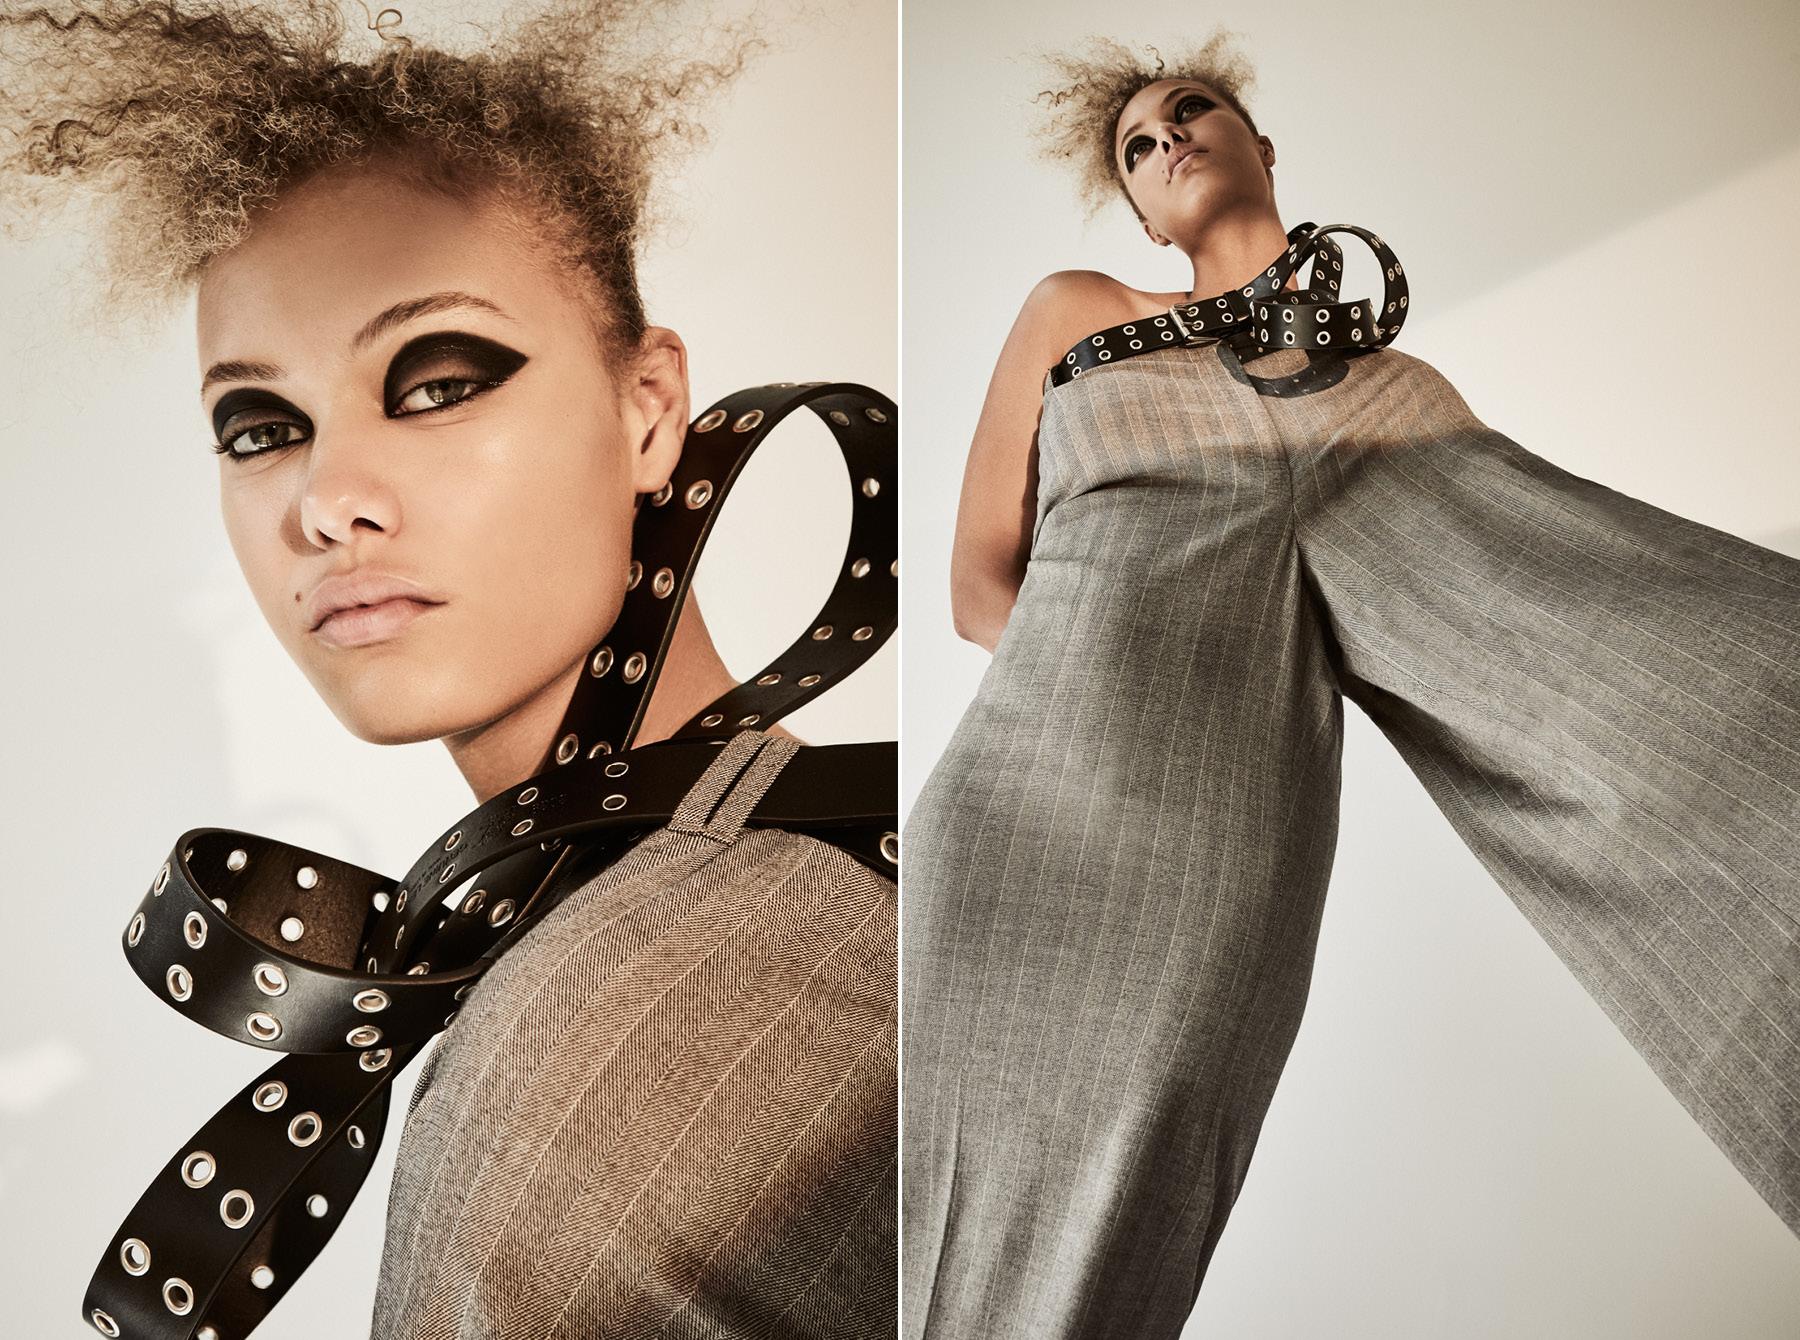 Spirit-&-Flesh-Magazine_Donovan_by_Matt-Licari_&_Blake-Glover_5